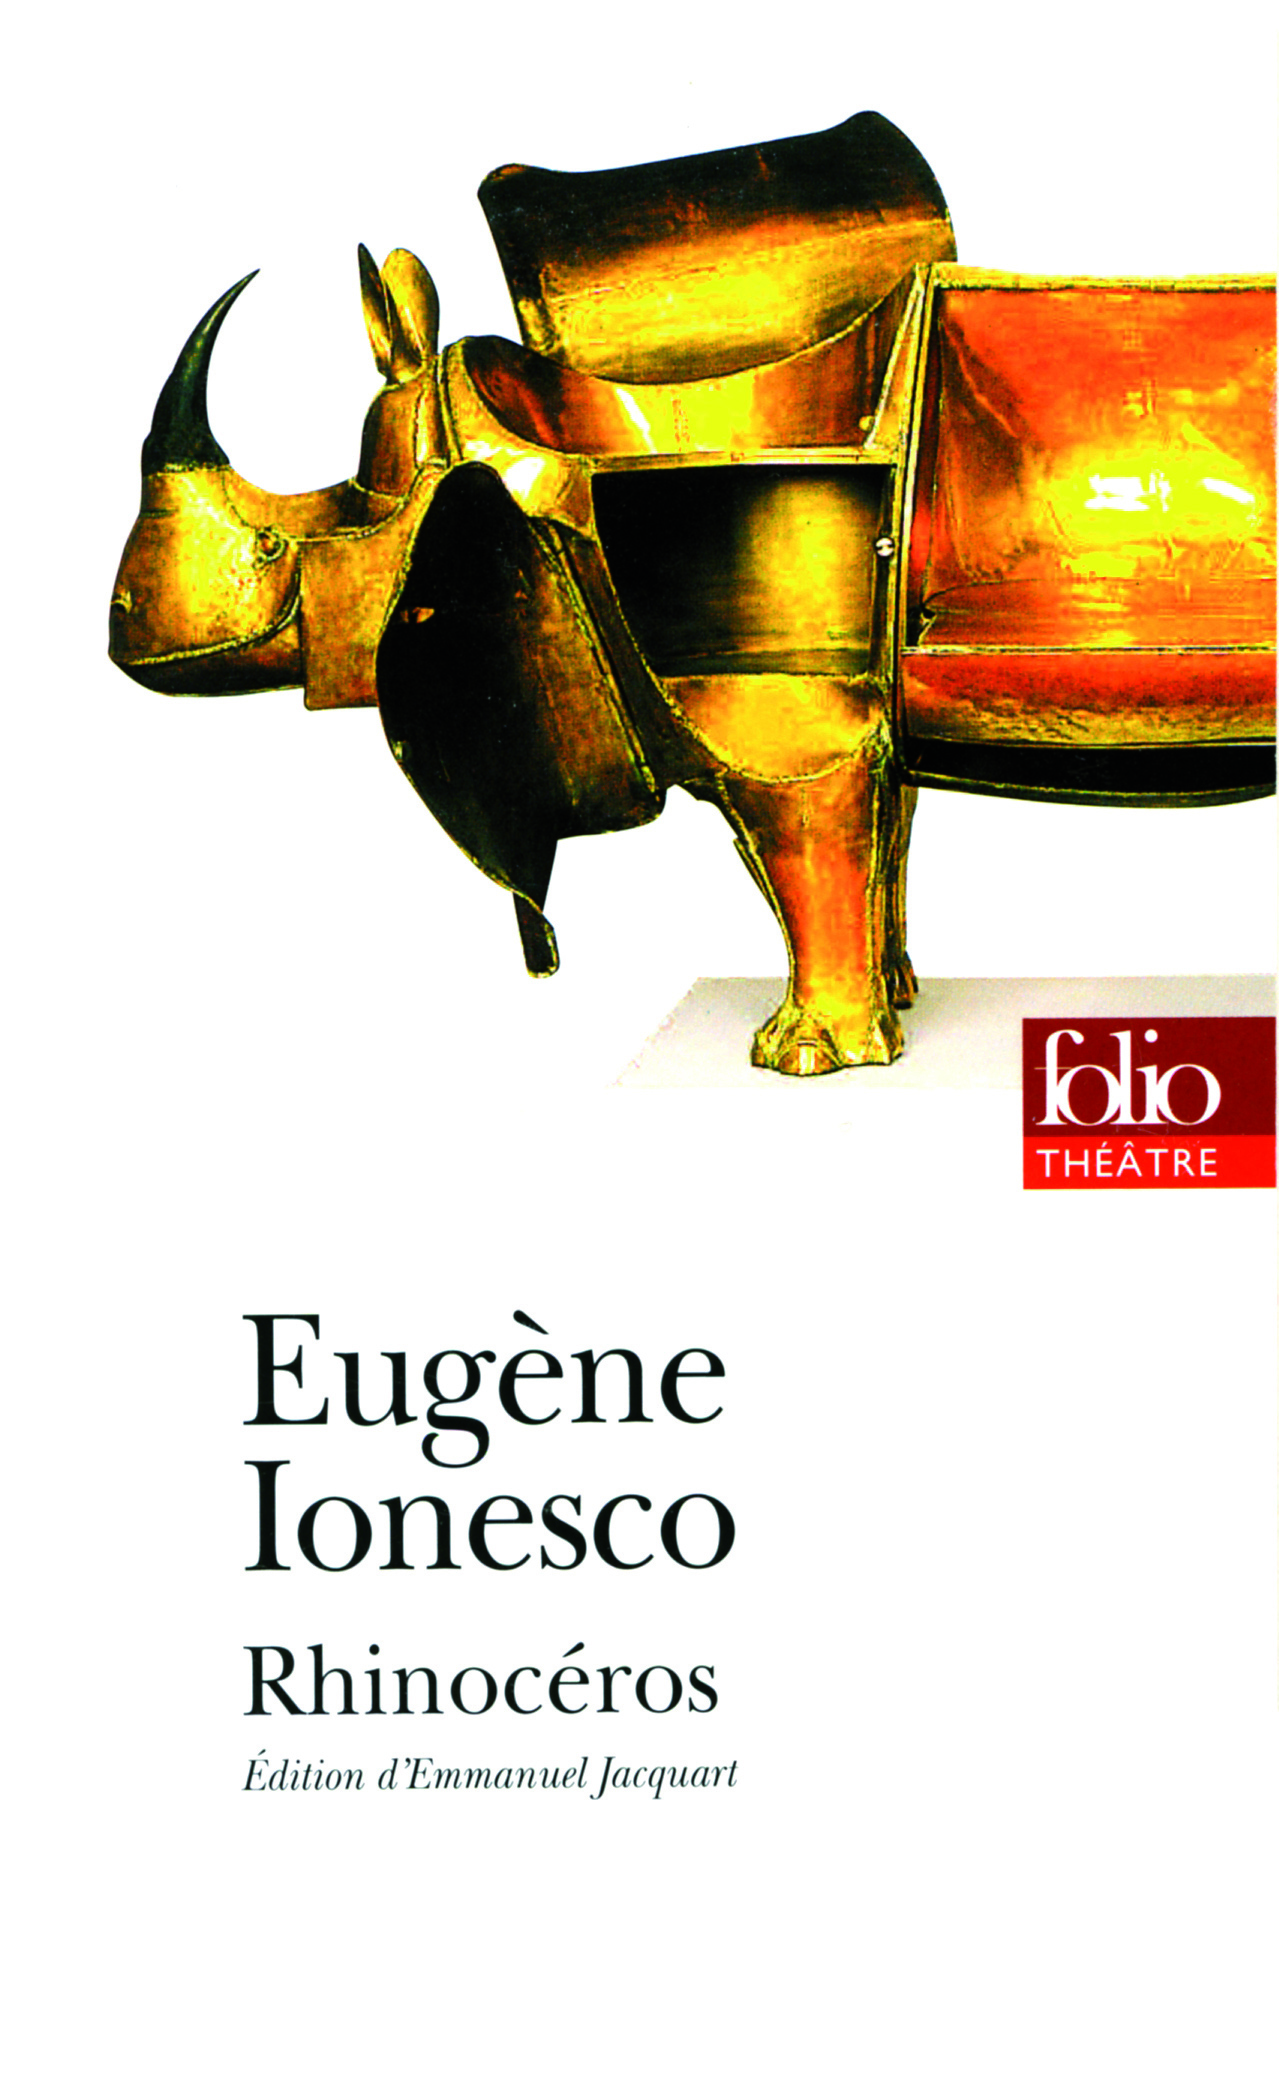 image de http://revueloiseaubleu.fr/wp-content/uploads/2021/06/Ionesco-Rhinocéros-Gallimard.jpg